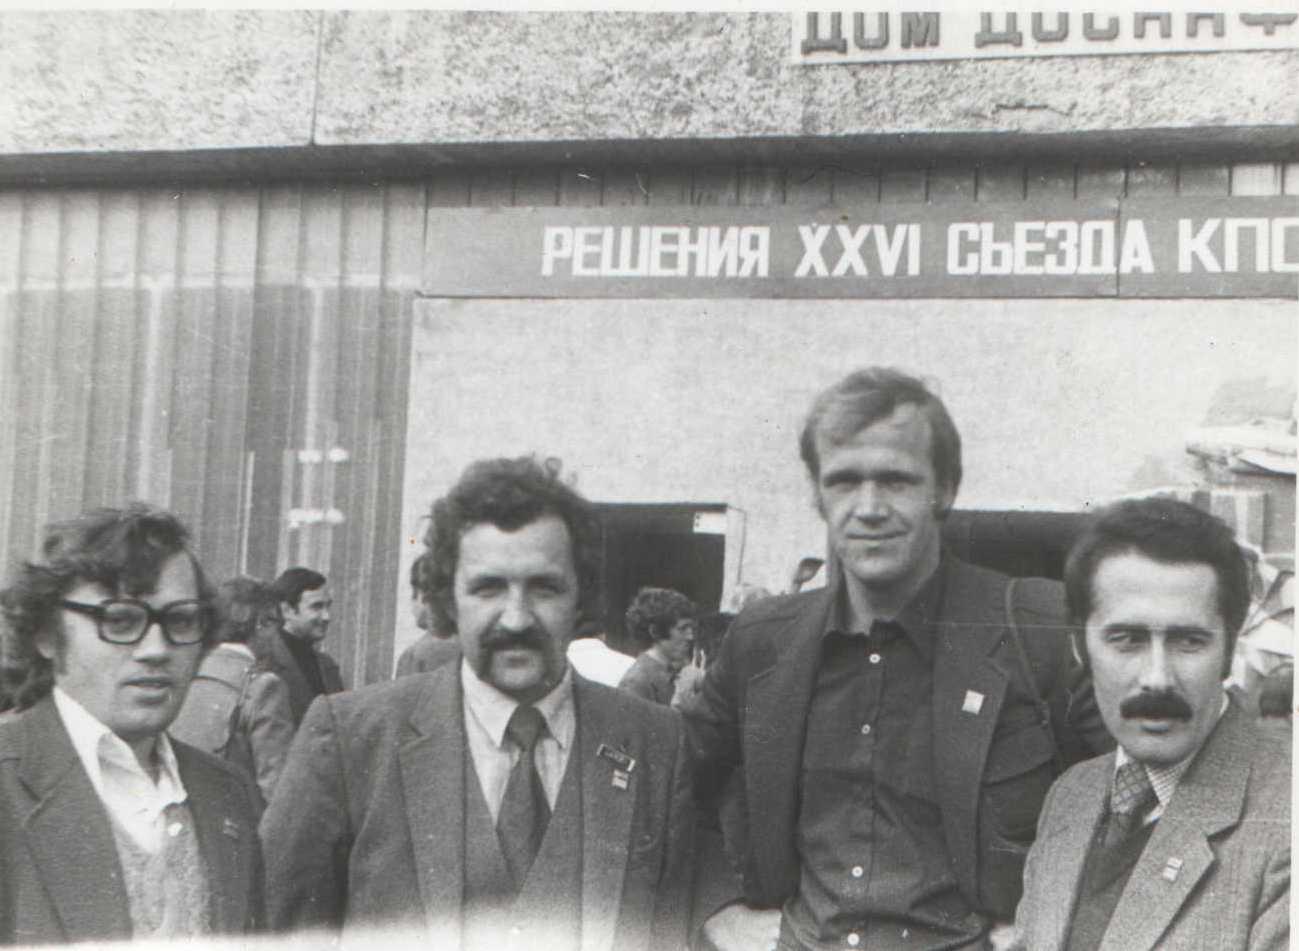 Нажмите на изображение для увеличения.  Название:Kiev-1983-UA3VCC-UB5GBD.jpg Просмотров:137 Размер:80.1 Кб ID:119631